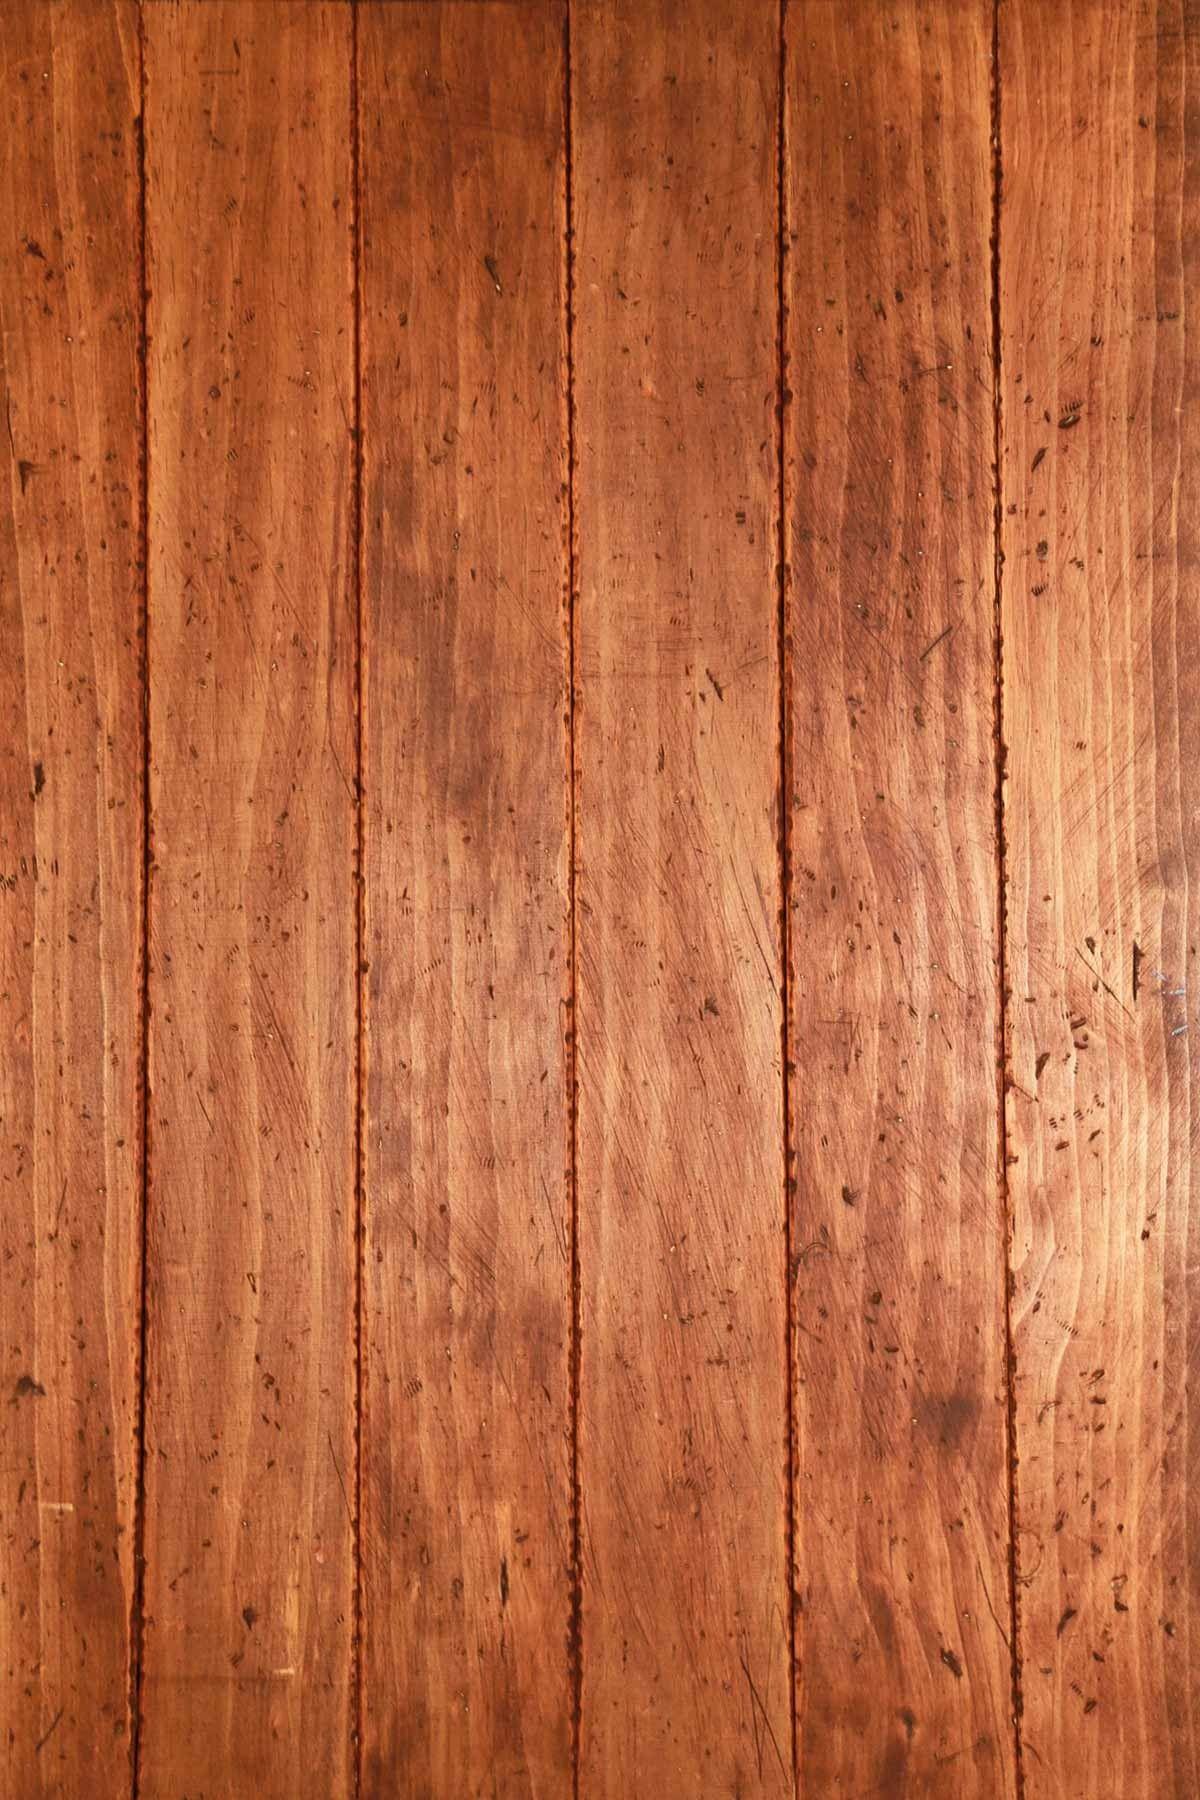 creative wood table food background 10